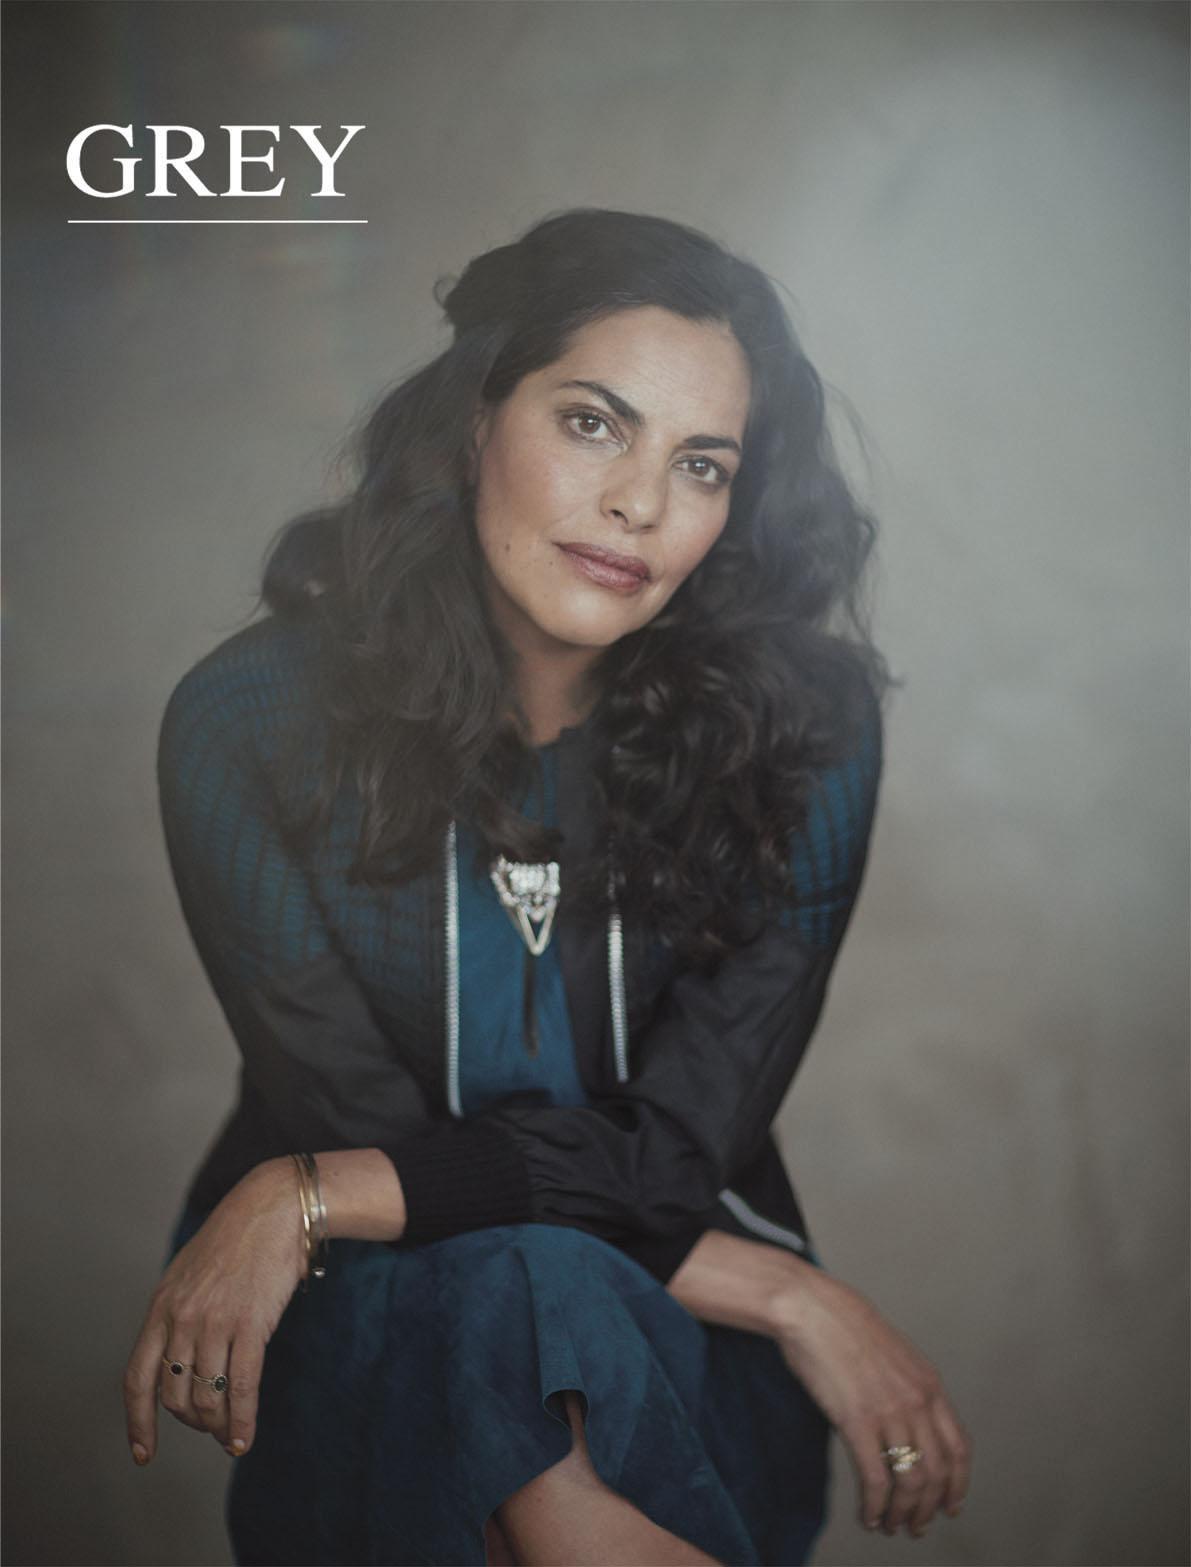 "GREY X SS 2014 ""Frames of Sarita"" | Garance Doré | Grey Magazine | Valentina Ilardi Martin | Numerique Retouch Photo Retouching Studio"